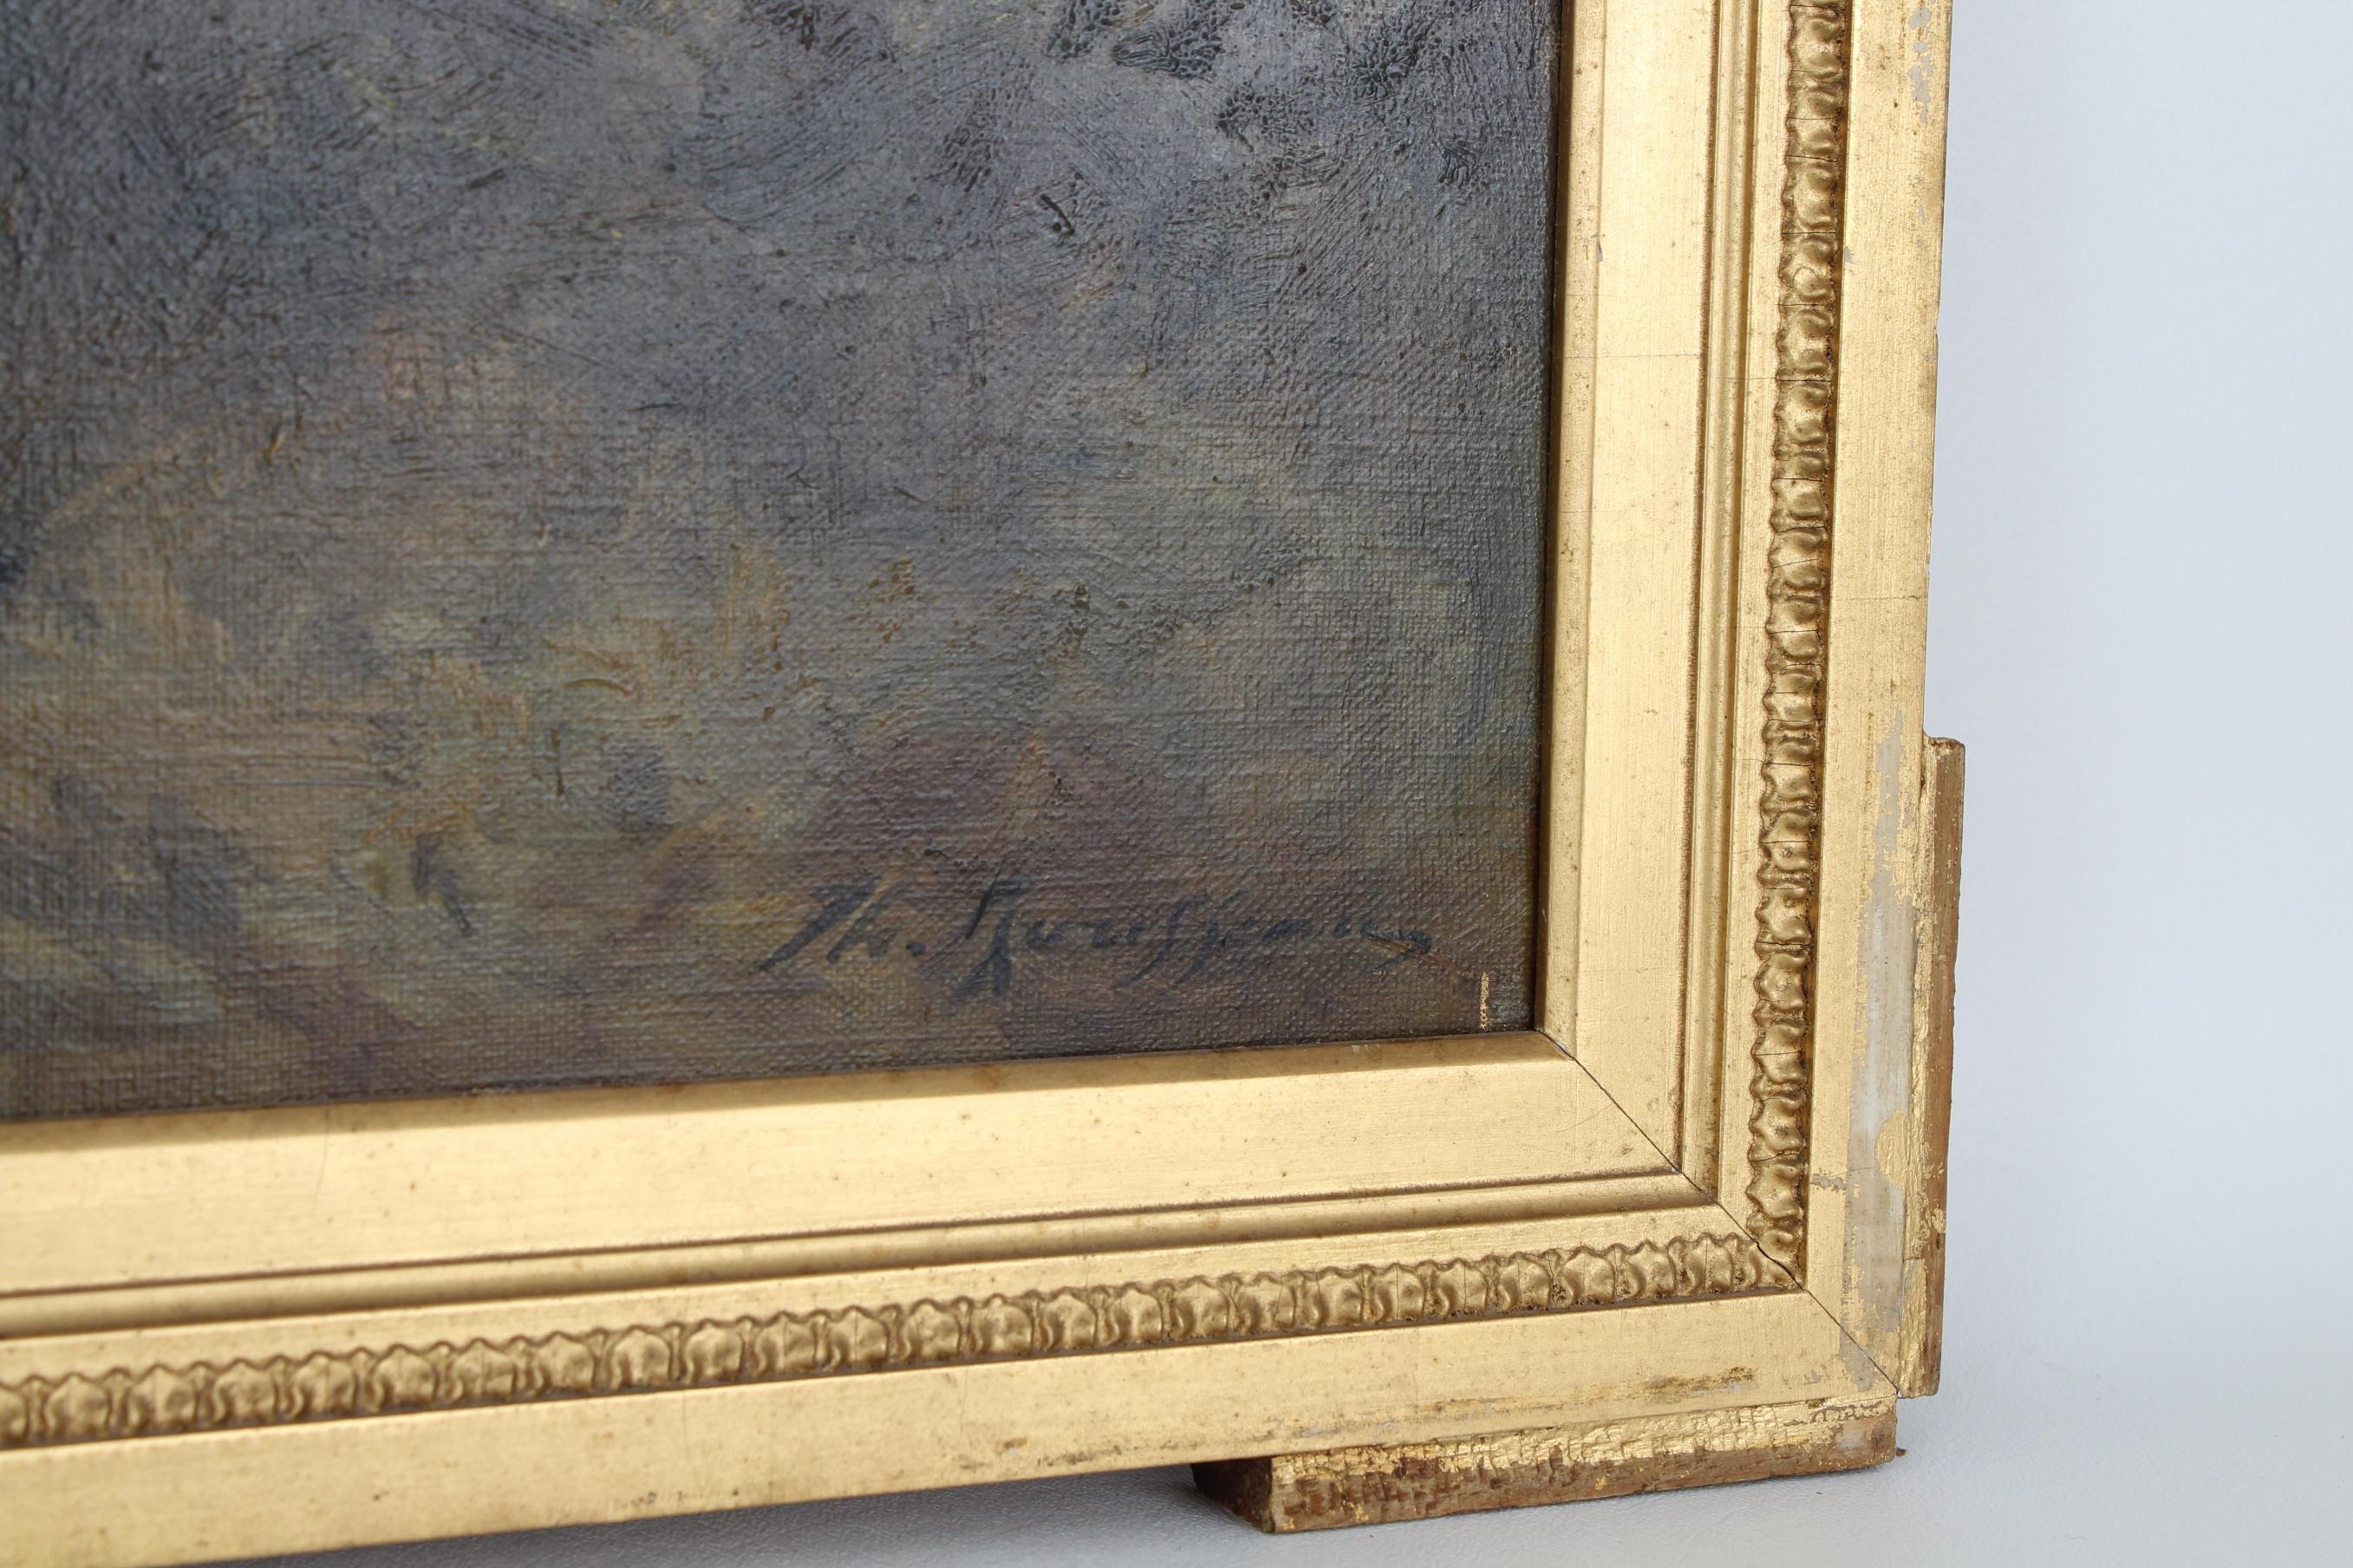 Attr. Theodore Rousseau (1812 - 1867) Barbizon - Image 4 of 6